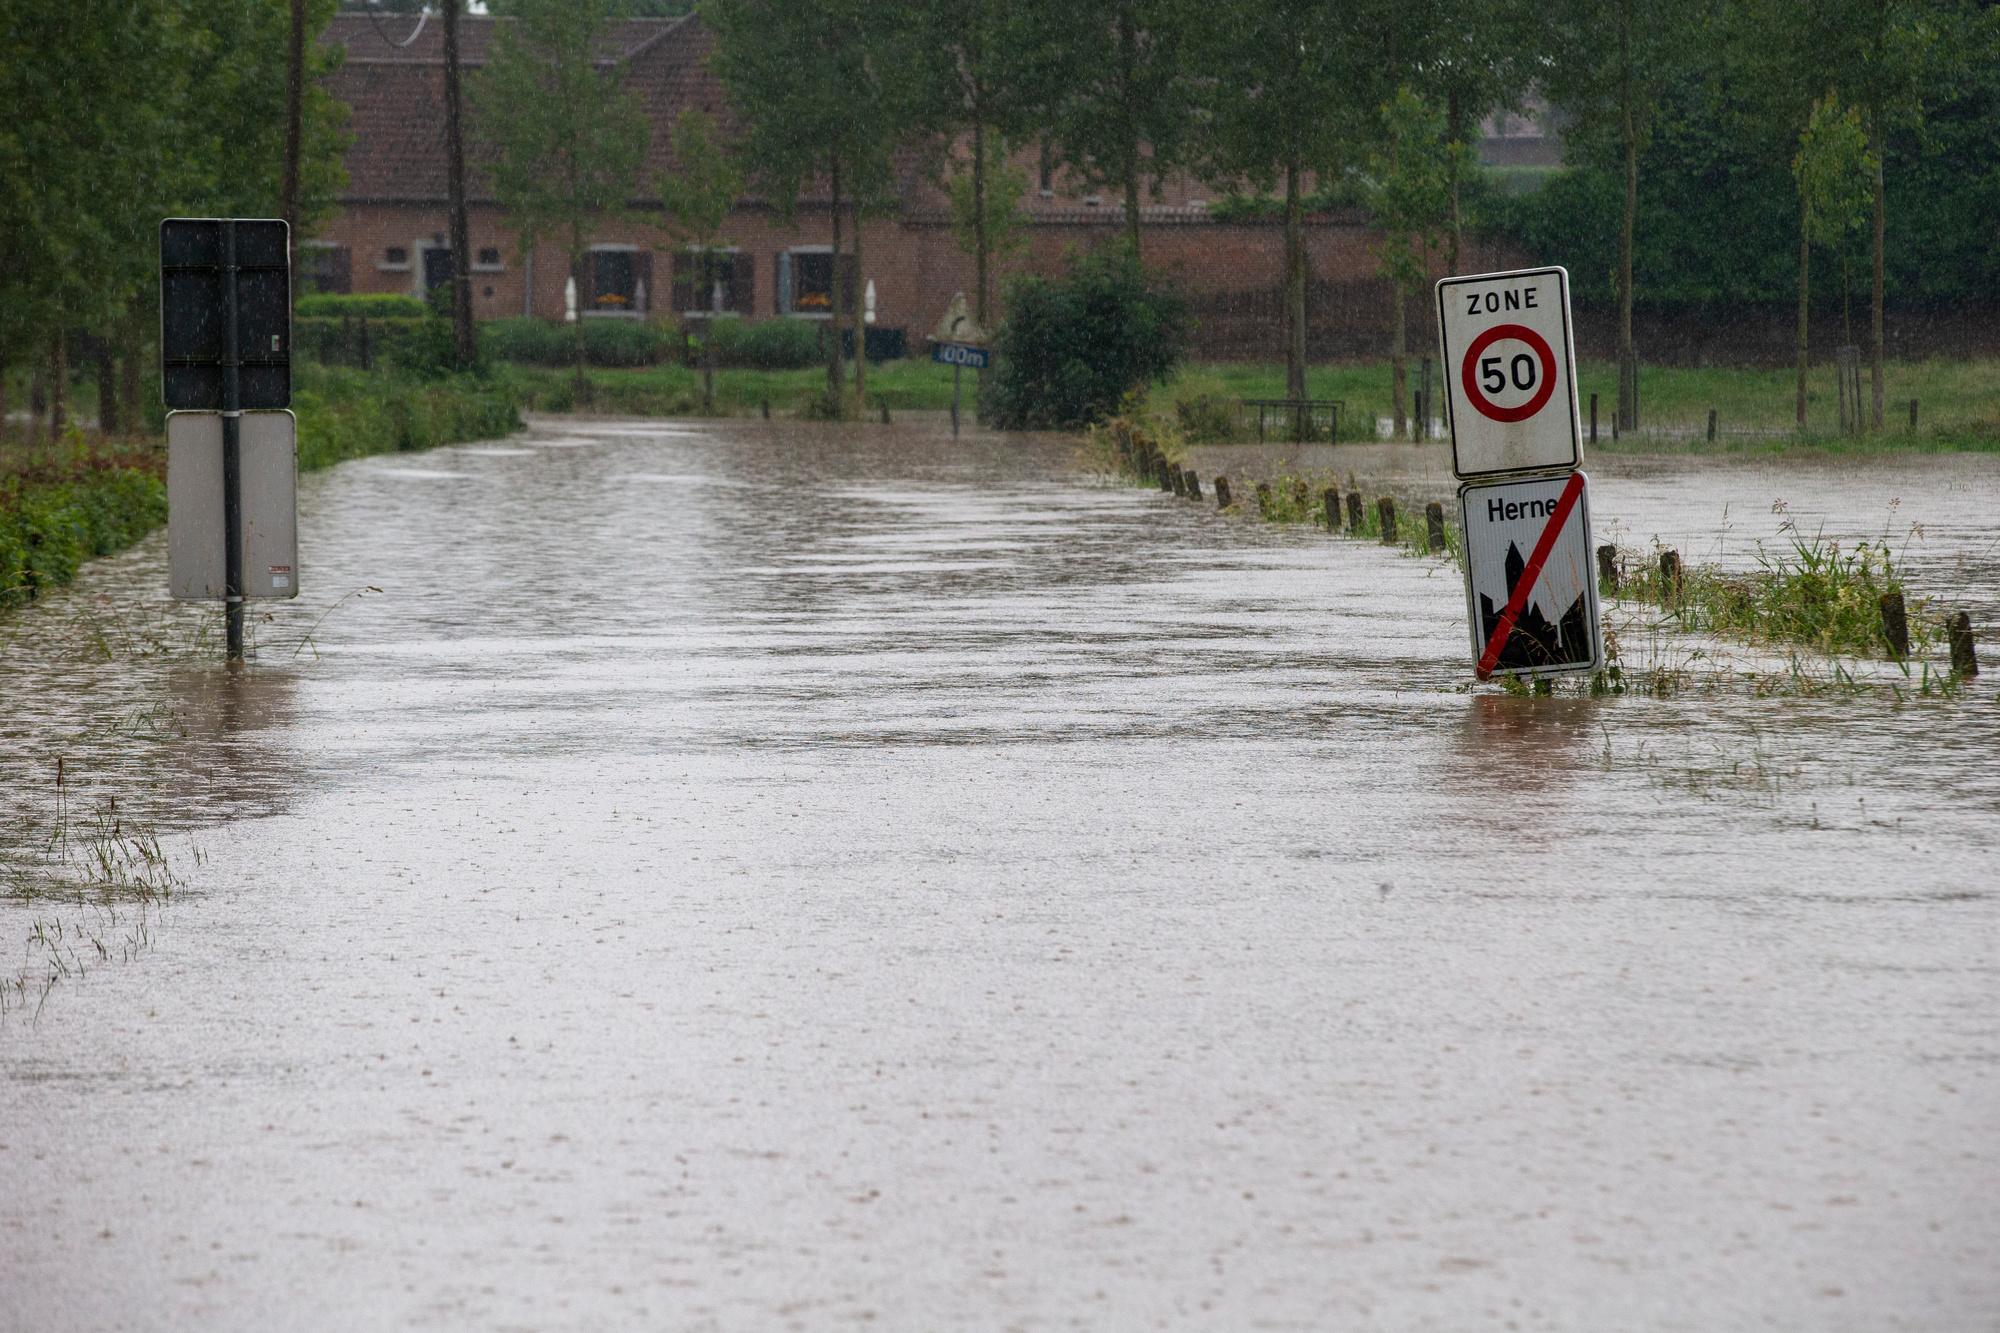 Herne (Hérinne), Brabant flamand, BELGA IMAGE